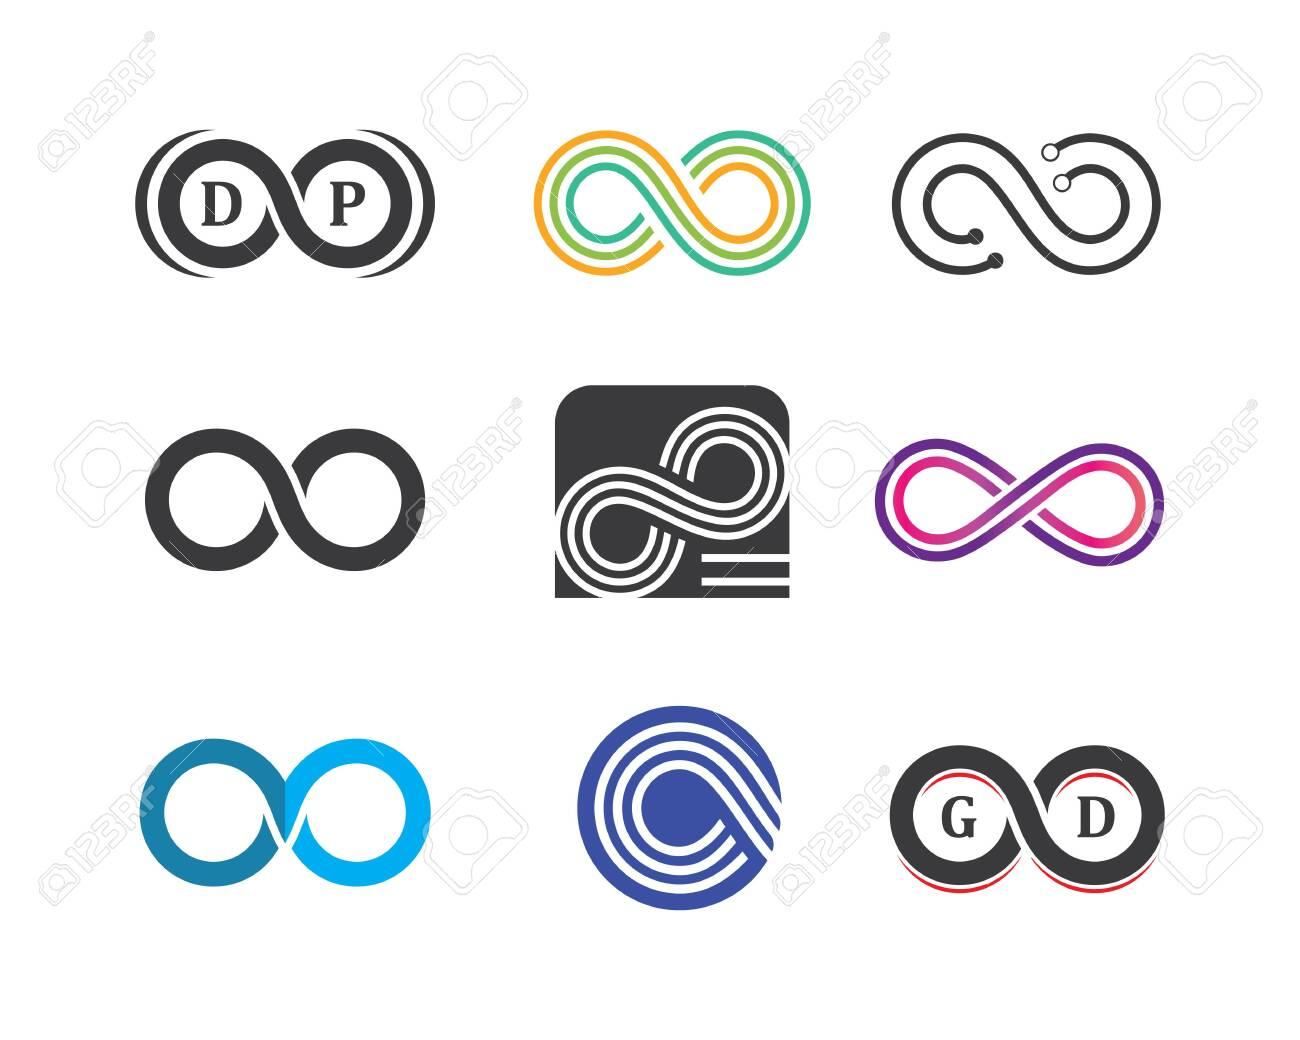 Infinity logo icon vector illustration design template - 136333897